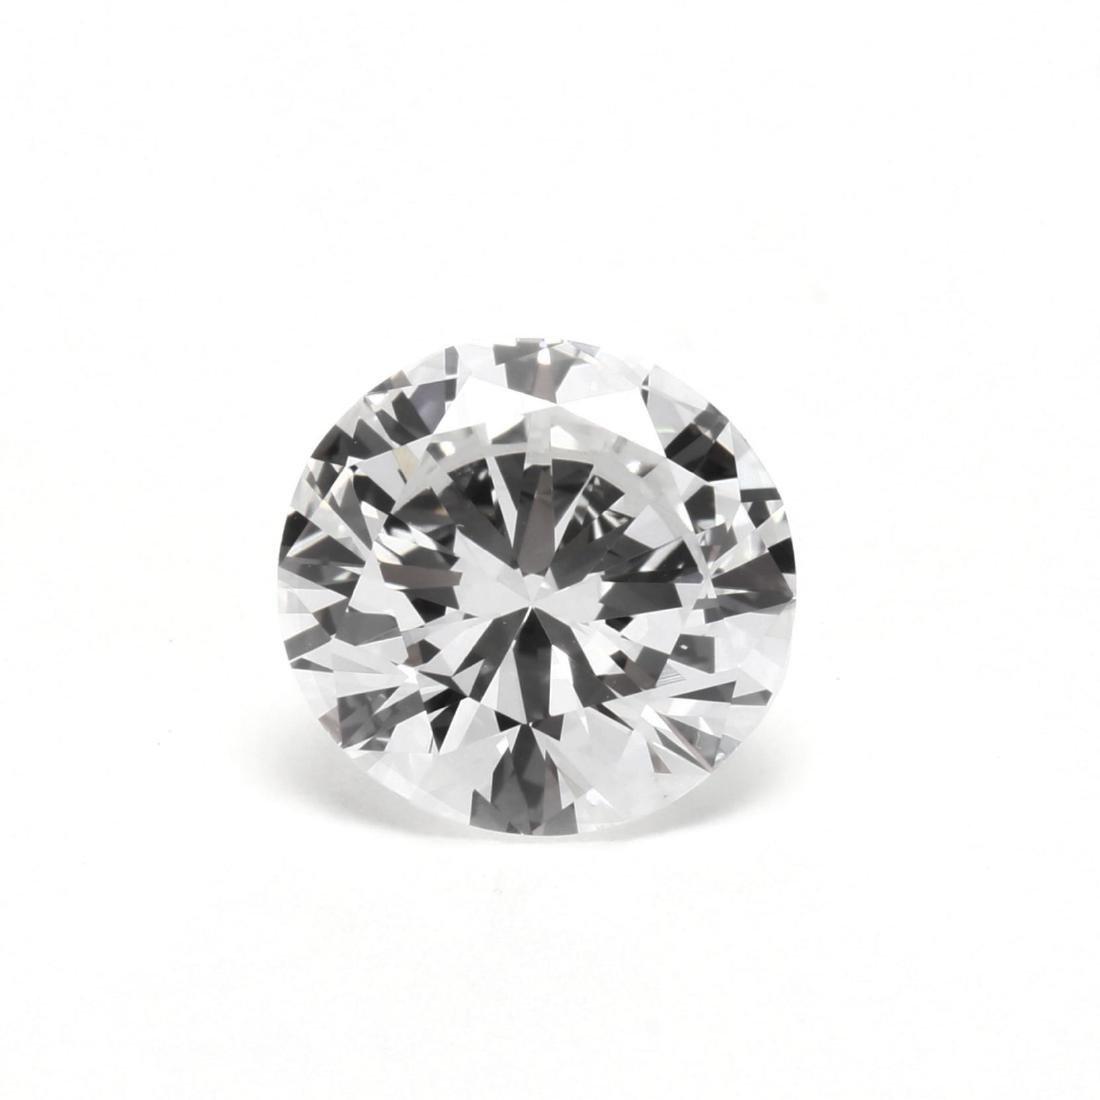 Unmounted Round Brilliant Cut Diamond with Platinum and - 2